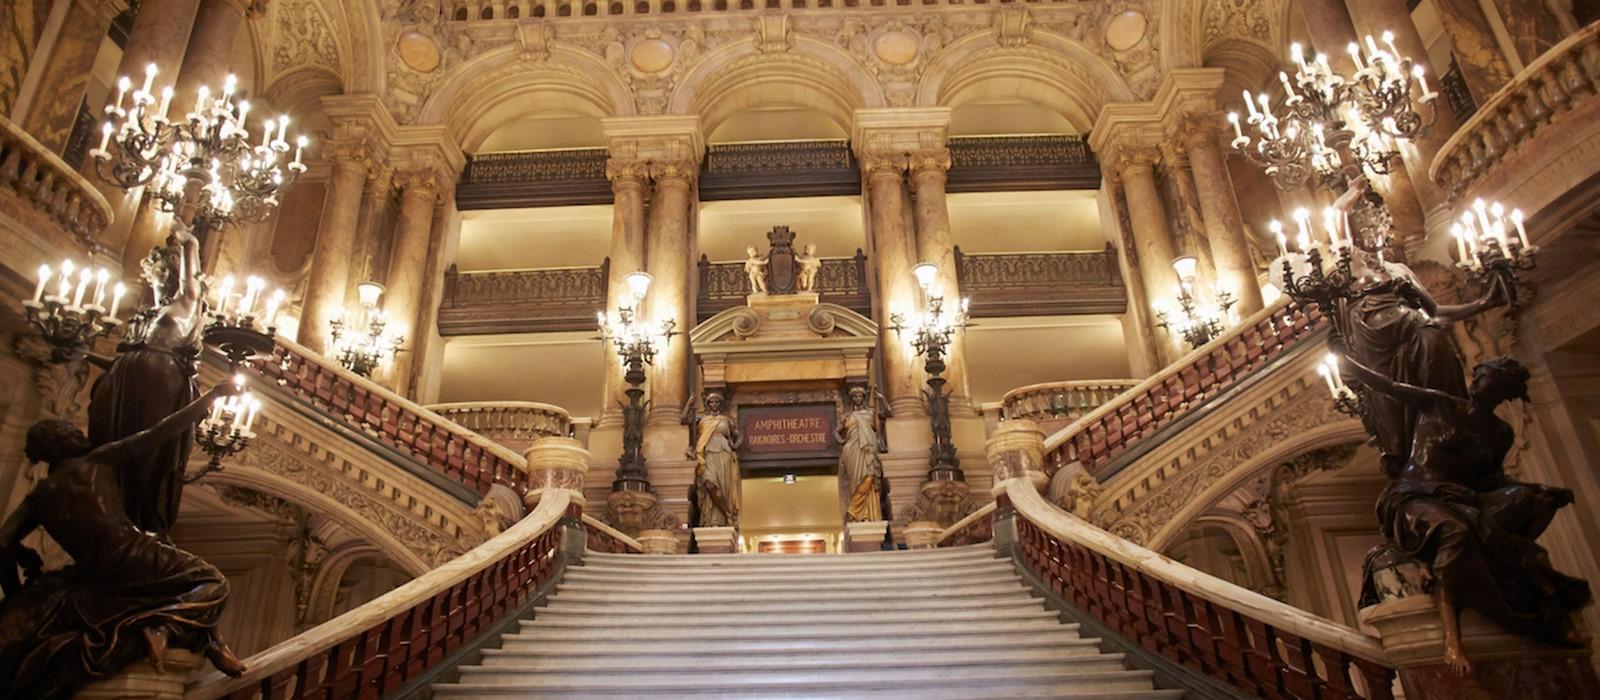 Royal Palace of Brussels by Architect Alphonse Balat: A resplendent vision of Grandeur - Sheet7